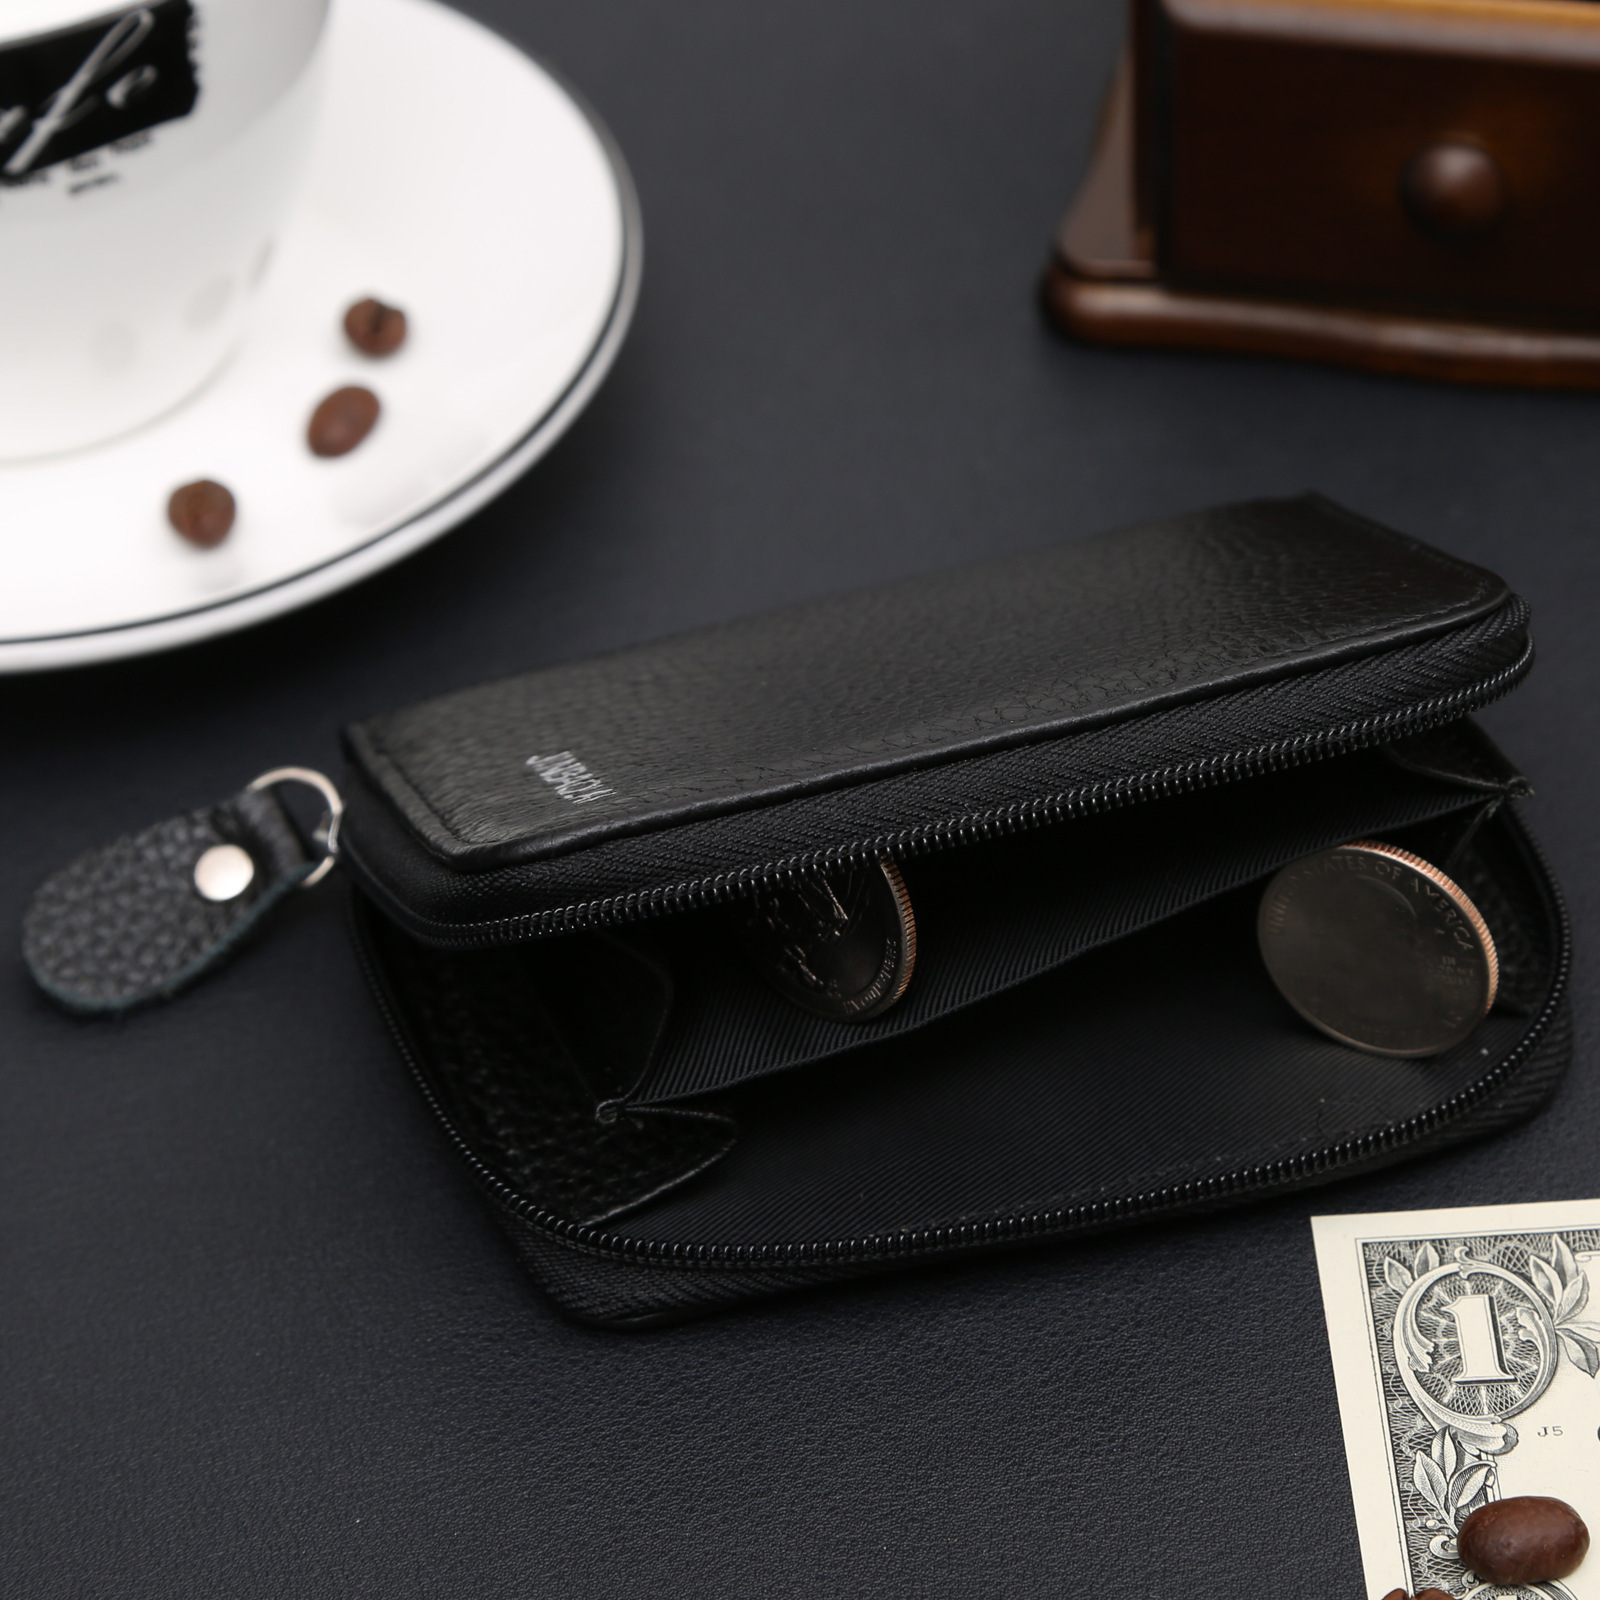 With Coin Bag Zipper Mini Wallets 2018 New Famous Brand Men Women Purse Thin Wallet Coin Purses Wallet carteira feminina 1